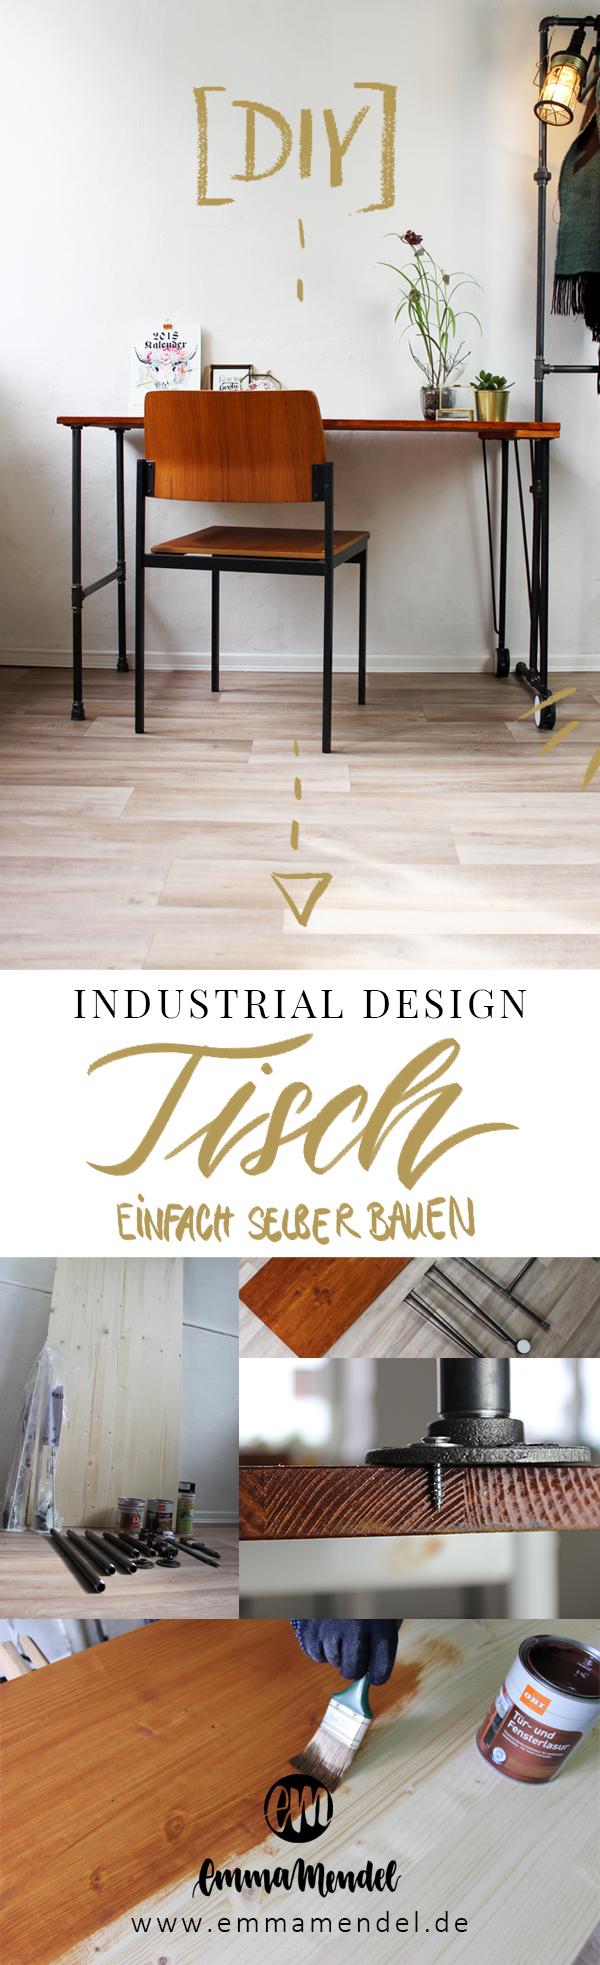 diy tisch industrial design selber bauen